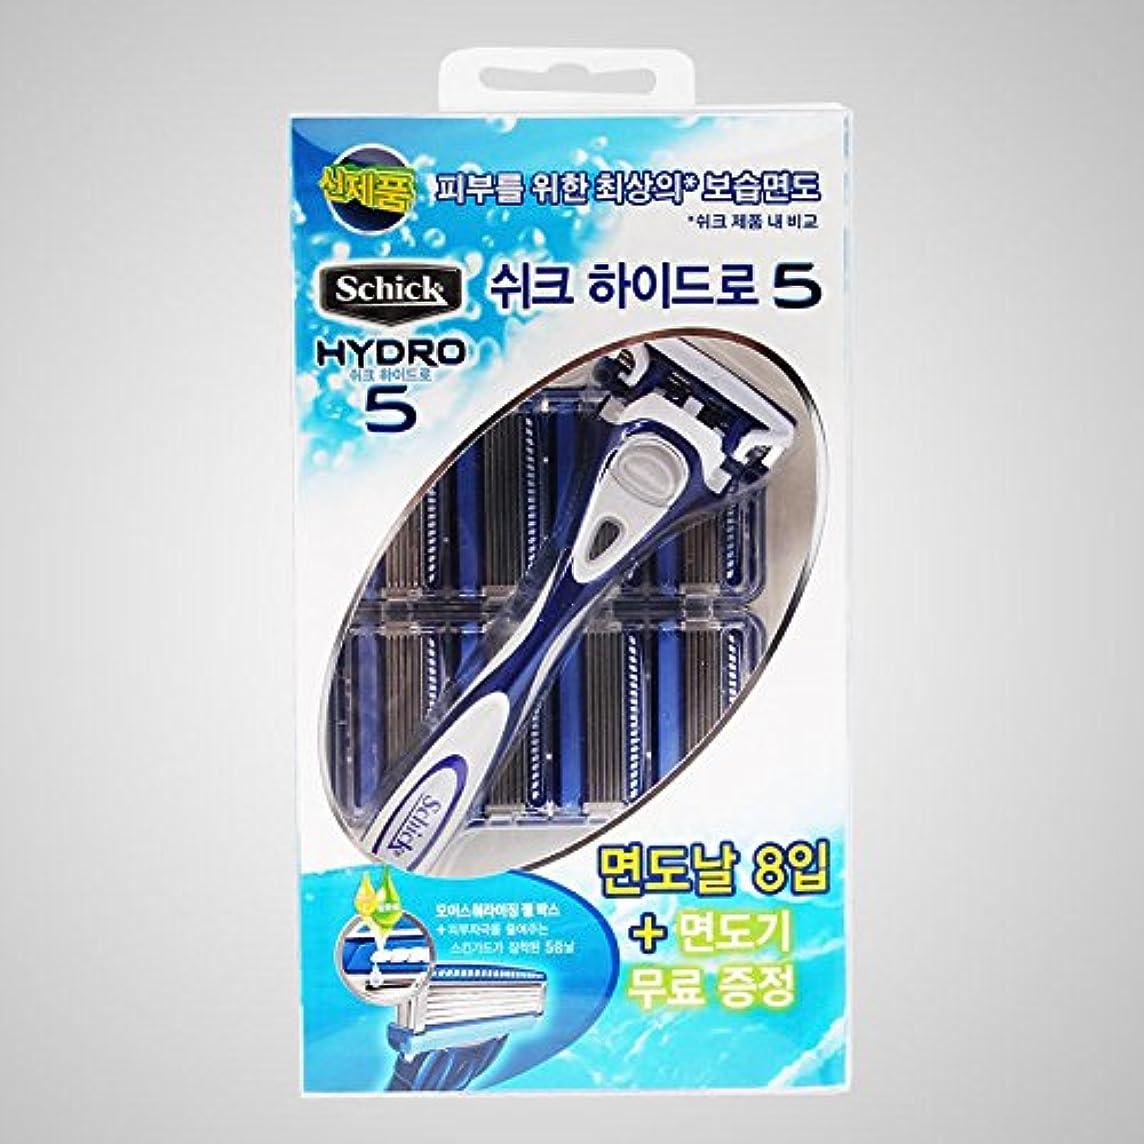 Schick Hydro 5 Shaving 1 Razor with 9 カートリッジ [並行輸入品]